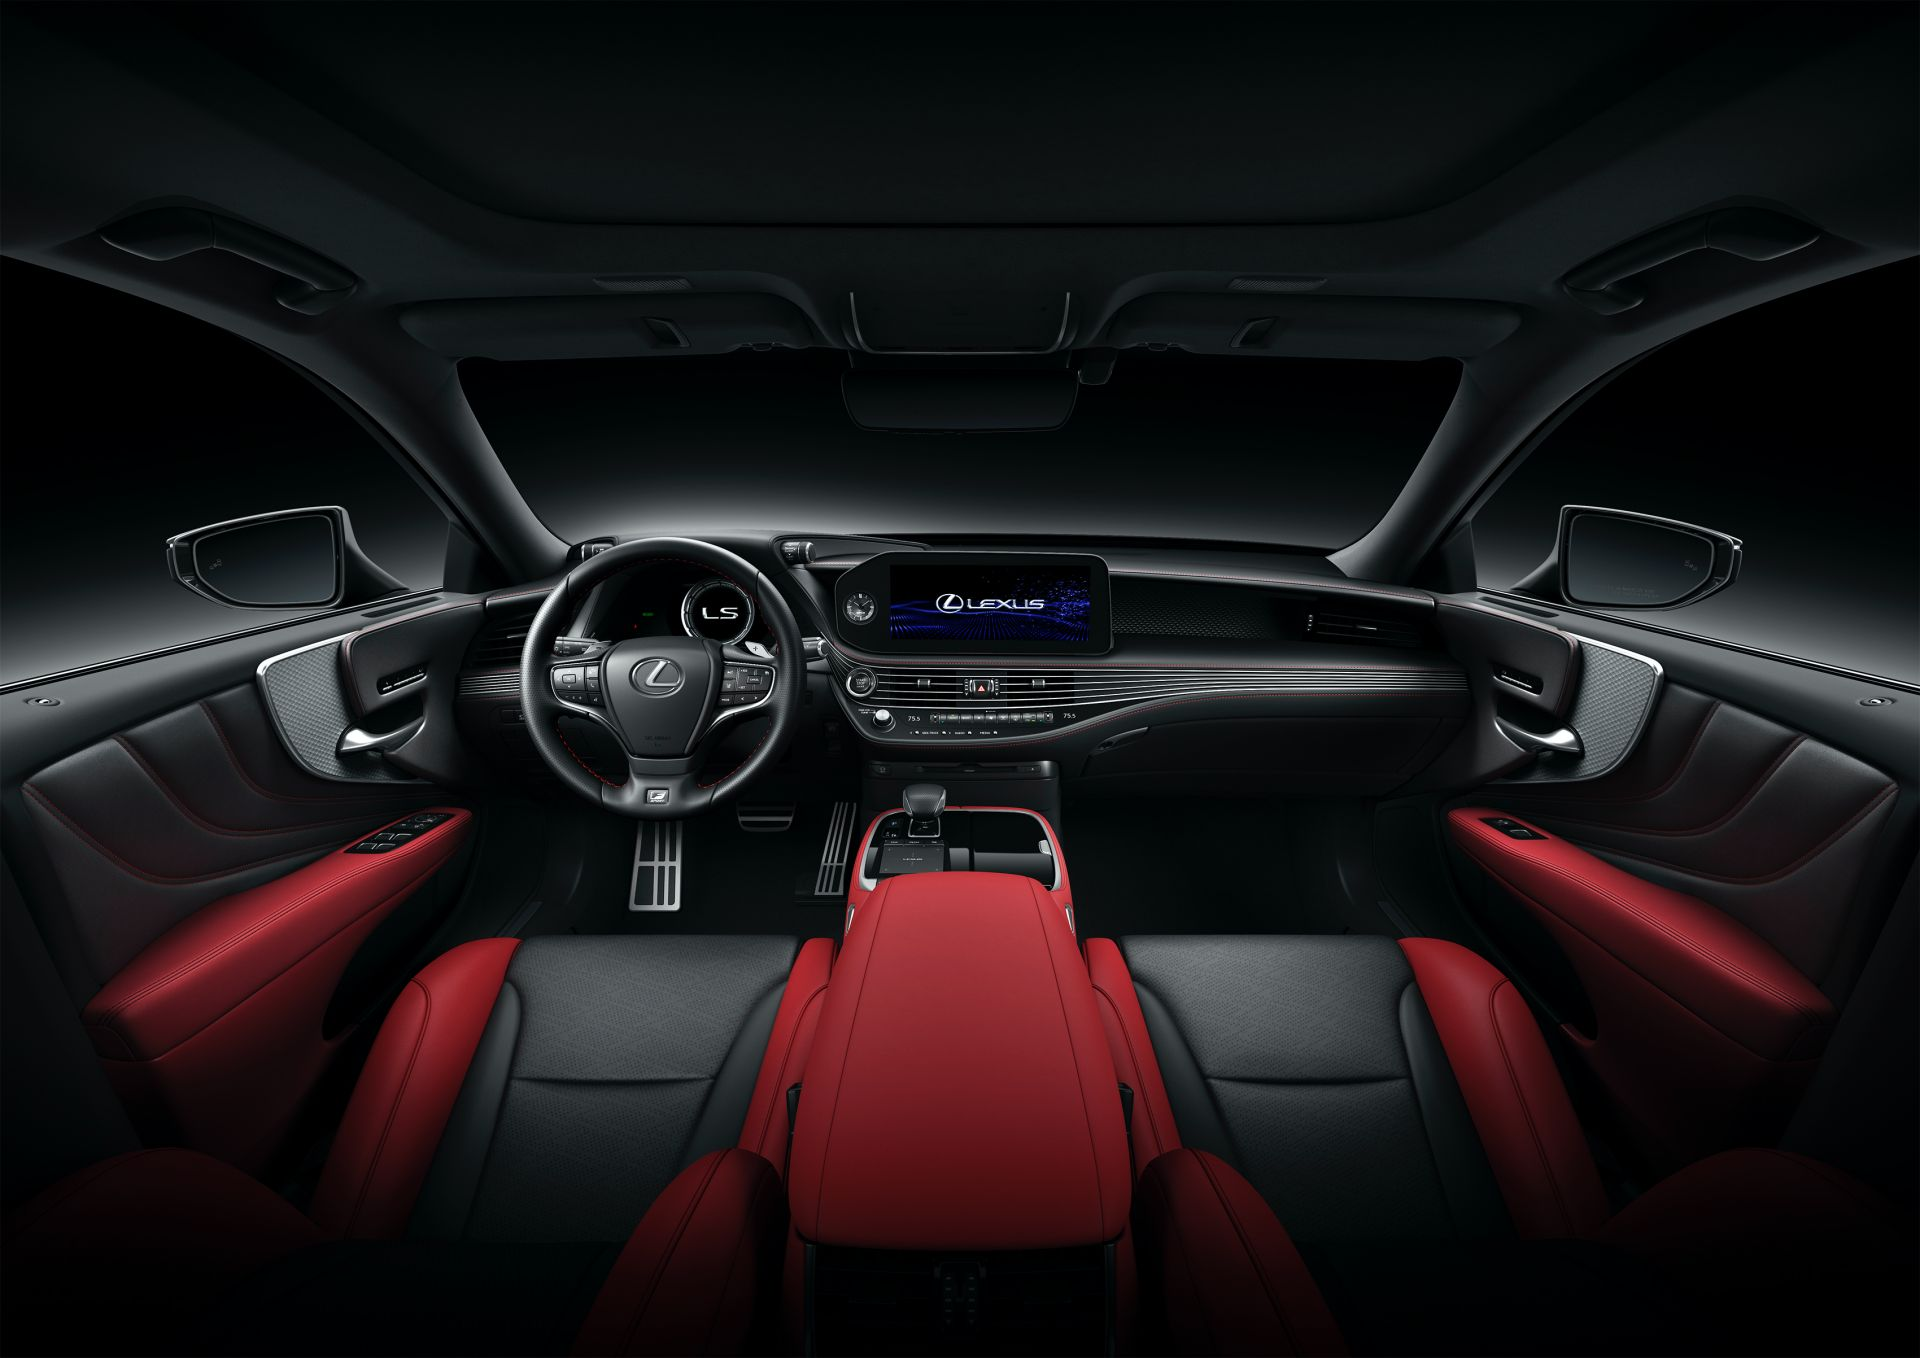 2021-lexus-ls-facelift-21.jpg